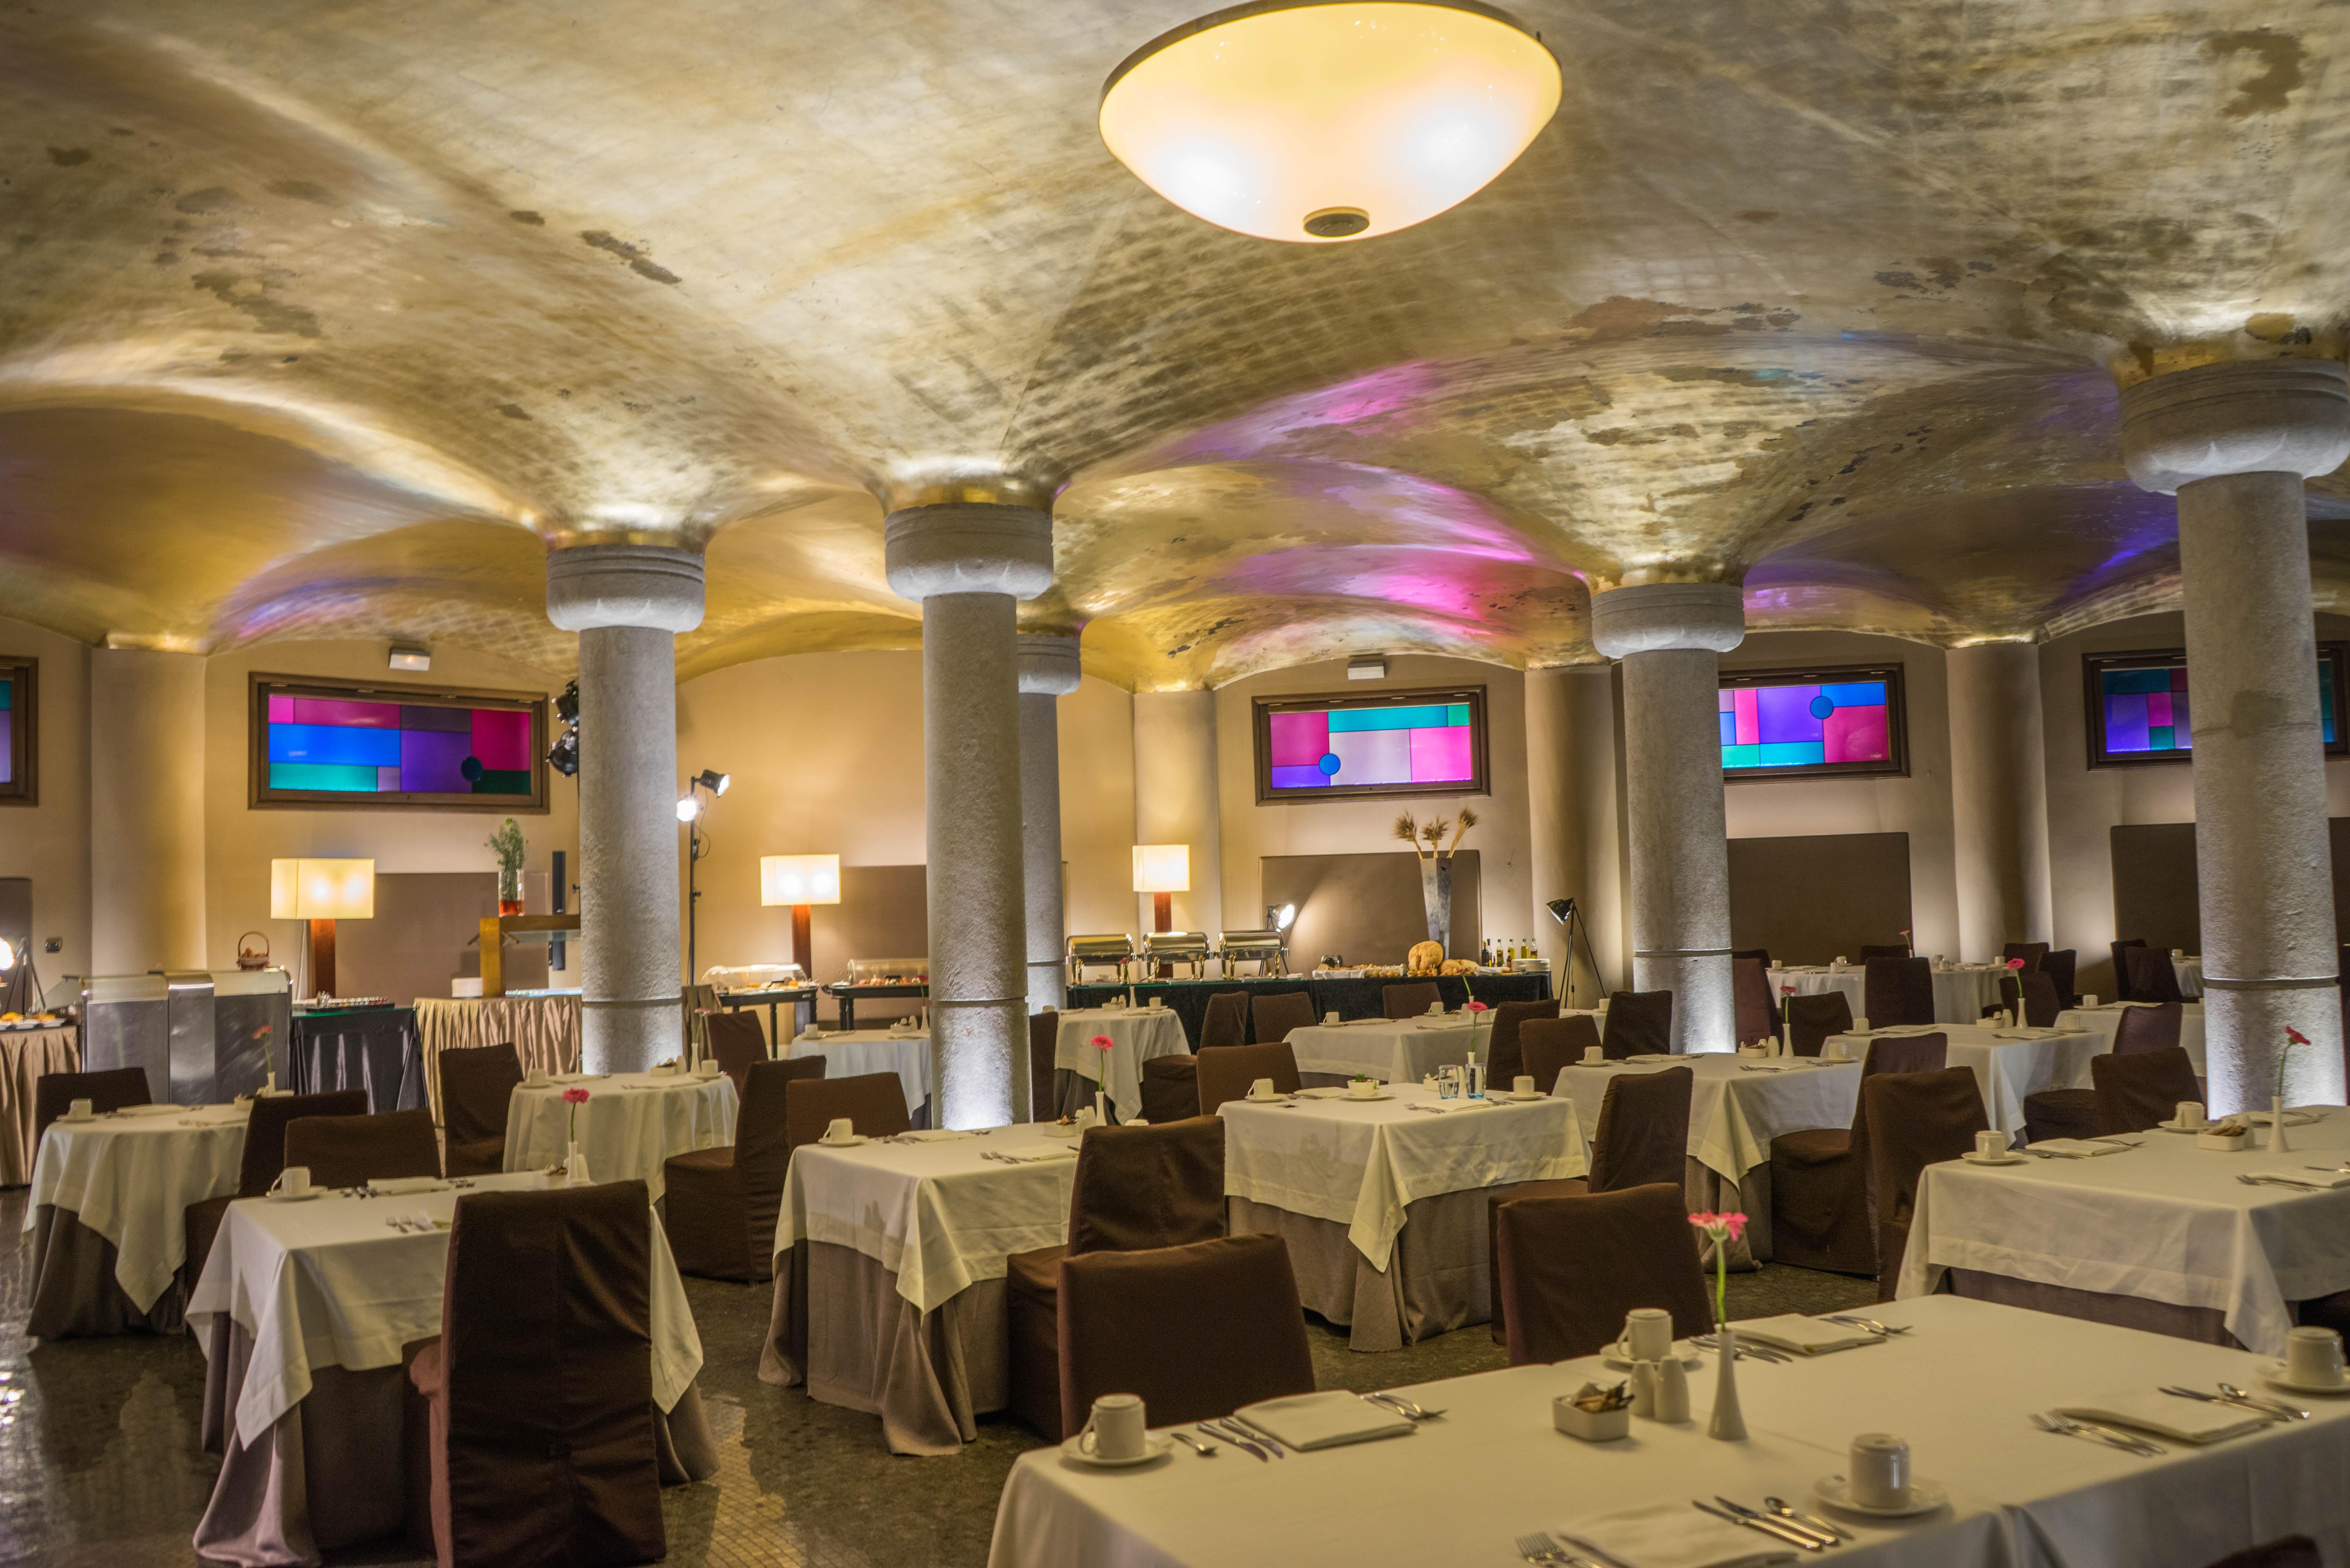 Fotos gratis : arquitectura, restaurante, viajar, Europa, comida ...